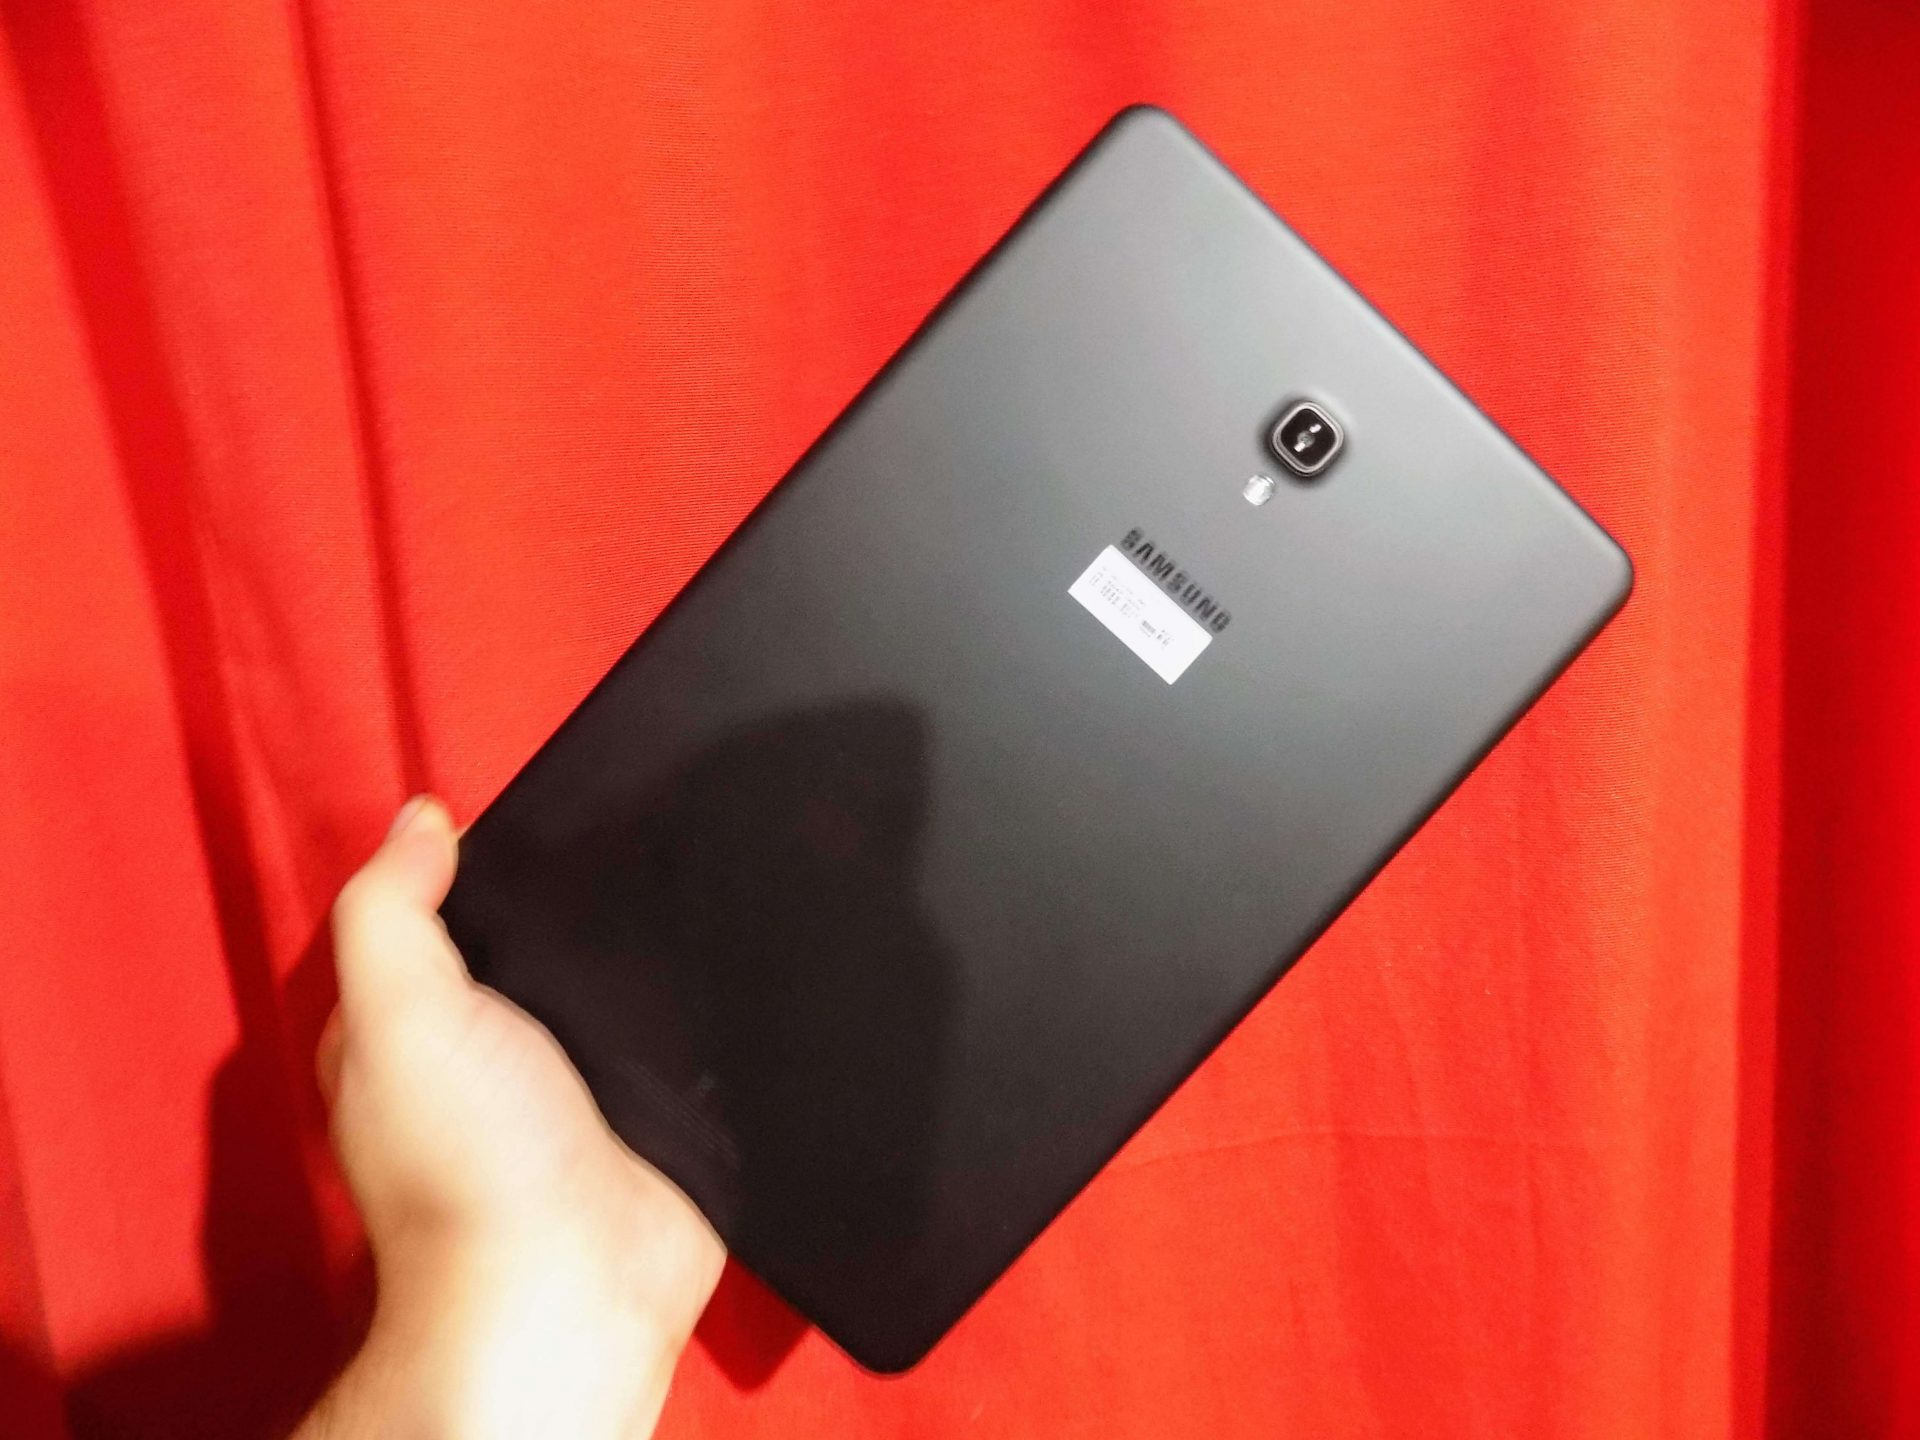 DSCN0168 - Review: Samsung Galaxy Tab A, o tablet perfeito para uso no dia-a-dia